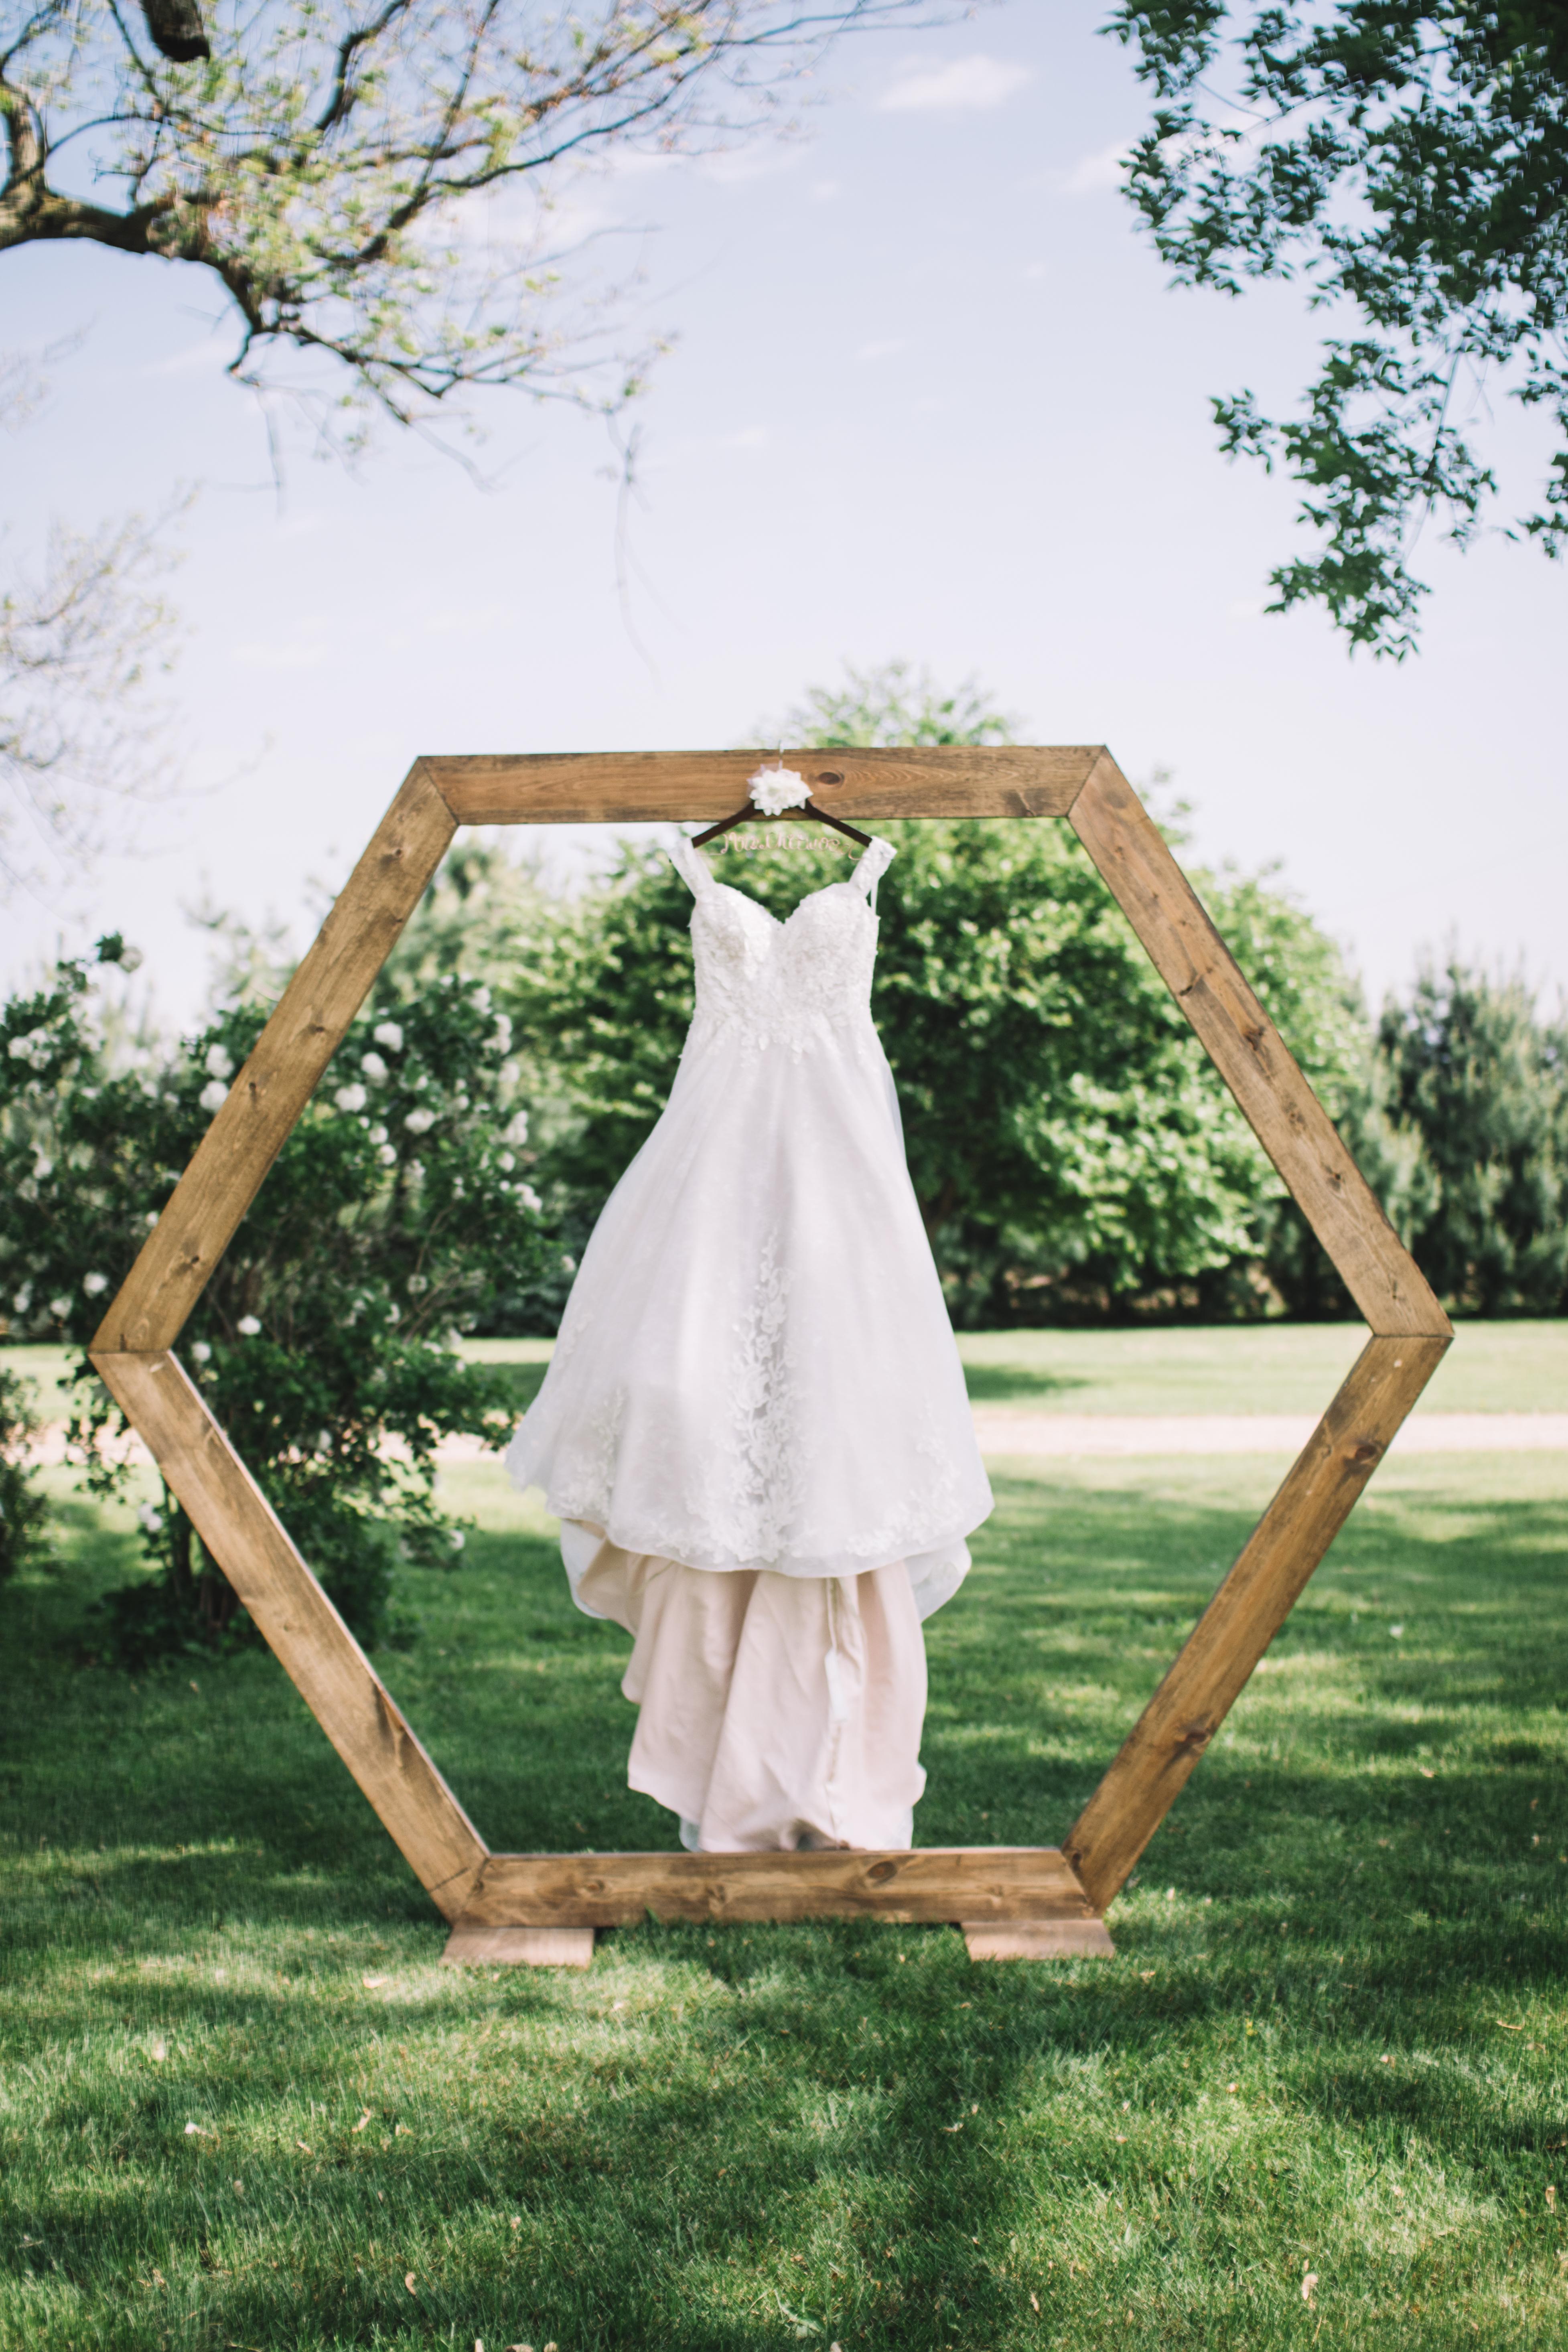 st louis wedding photographer, outdoor wedding, outdoor illinois wedding, bloomington il wedding dre